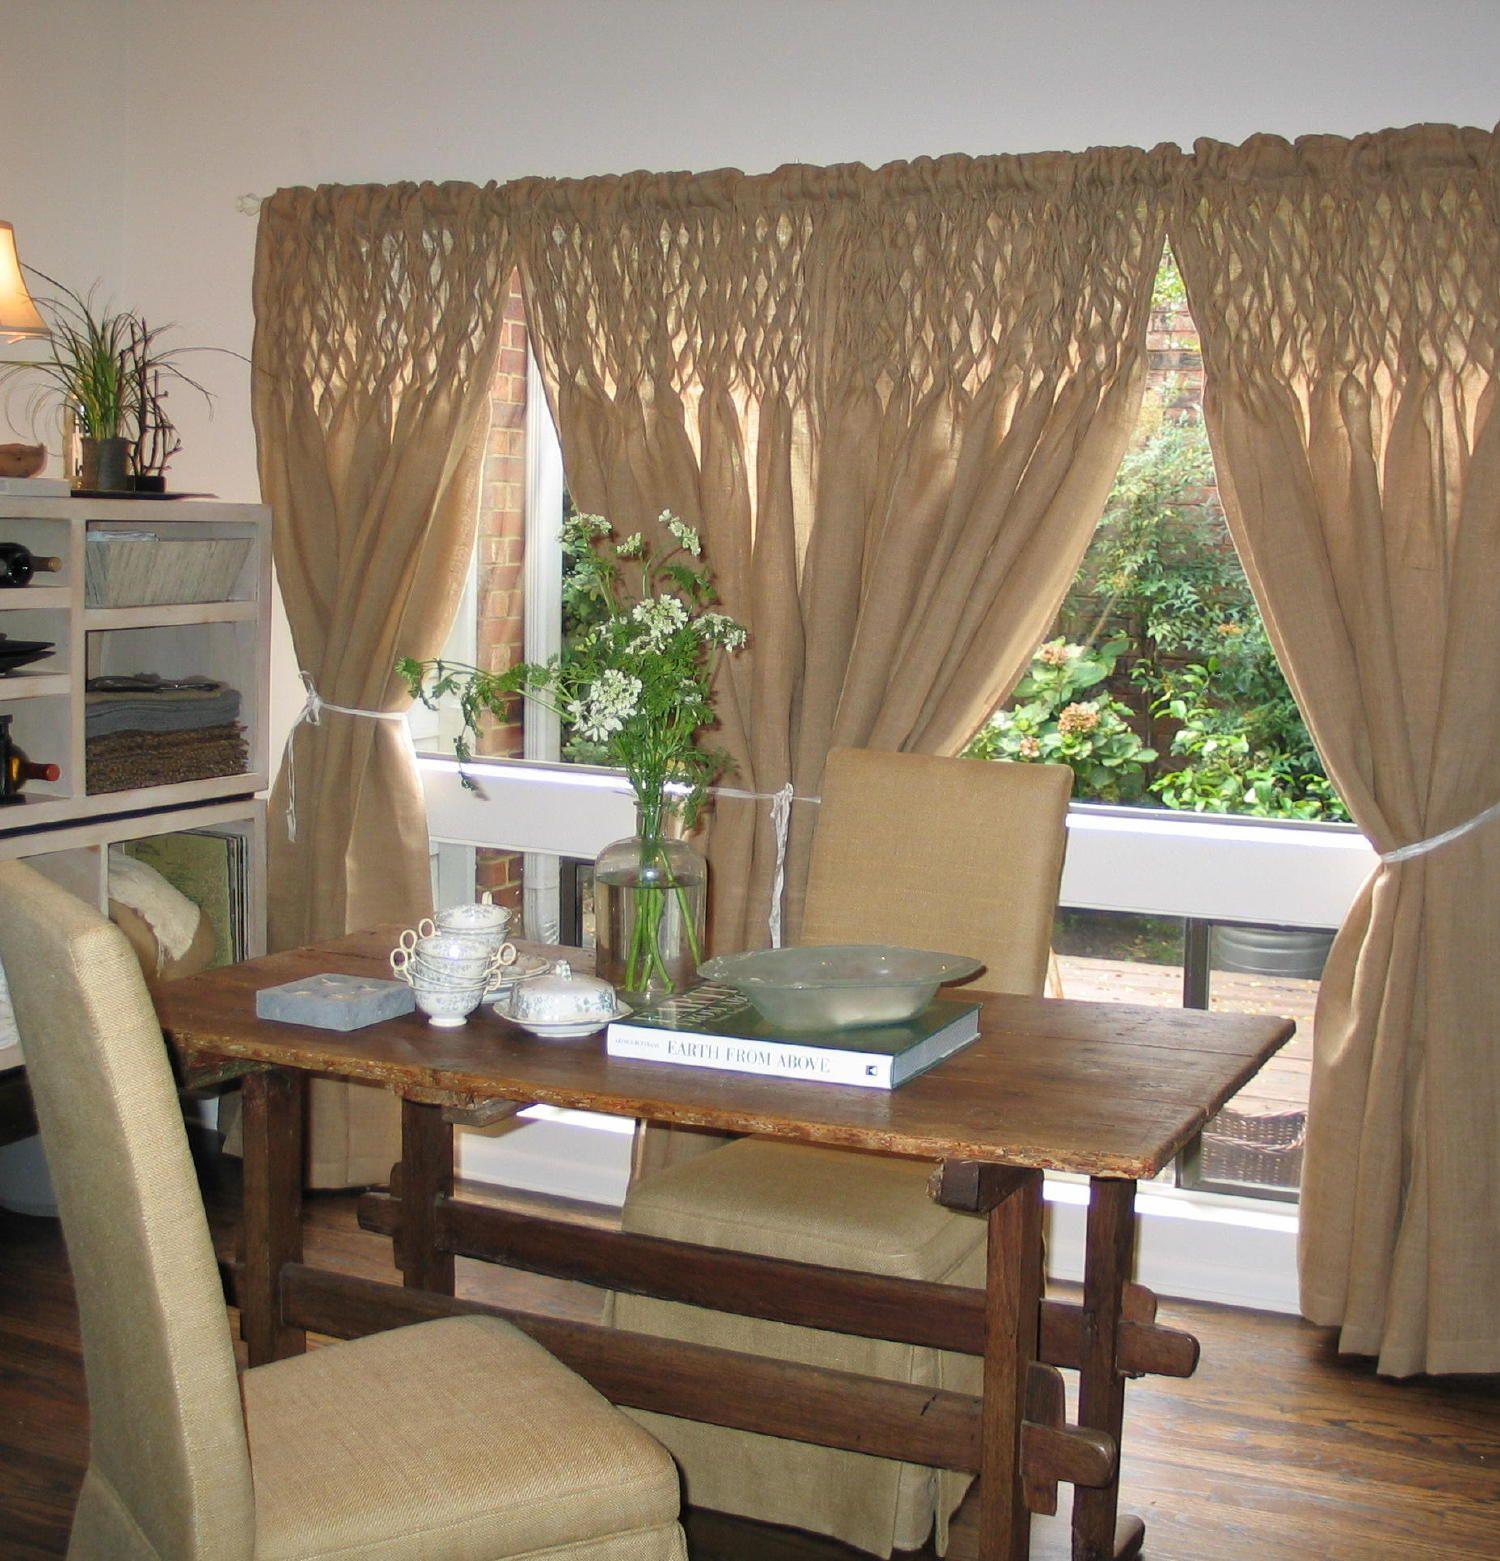 Hand Smocked Jute Curtain Panel Home Decor Decor Country Decor